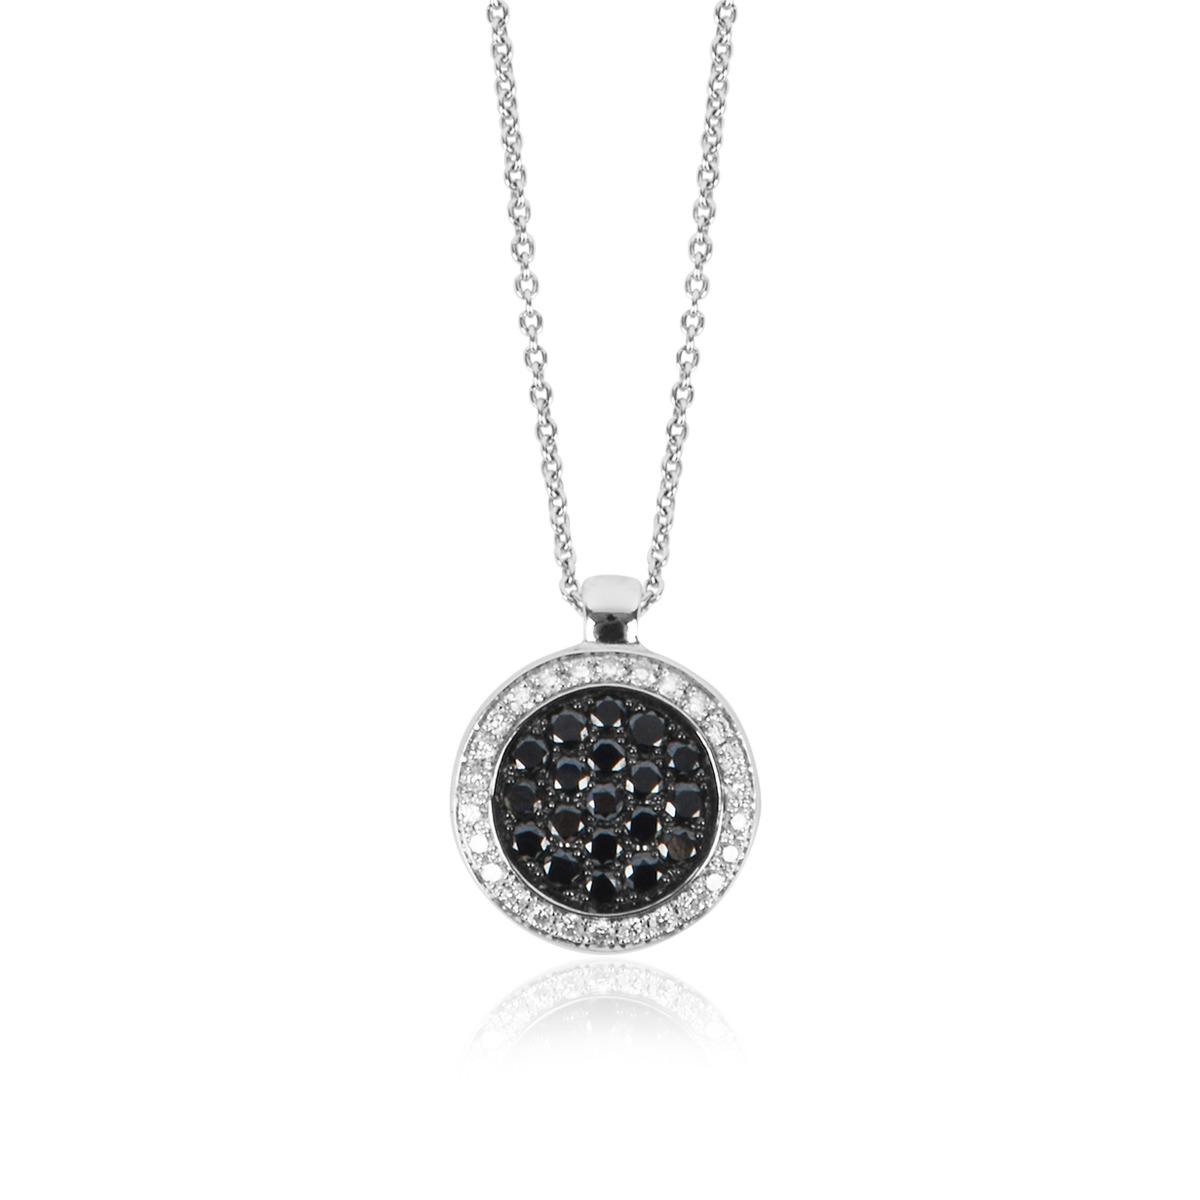 18ct White Gold Black and White Diamond Set Circle Pendant with Chain